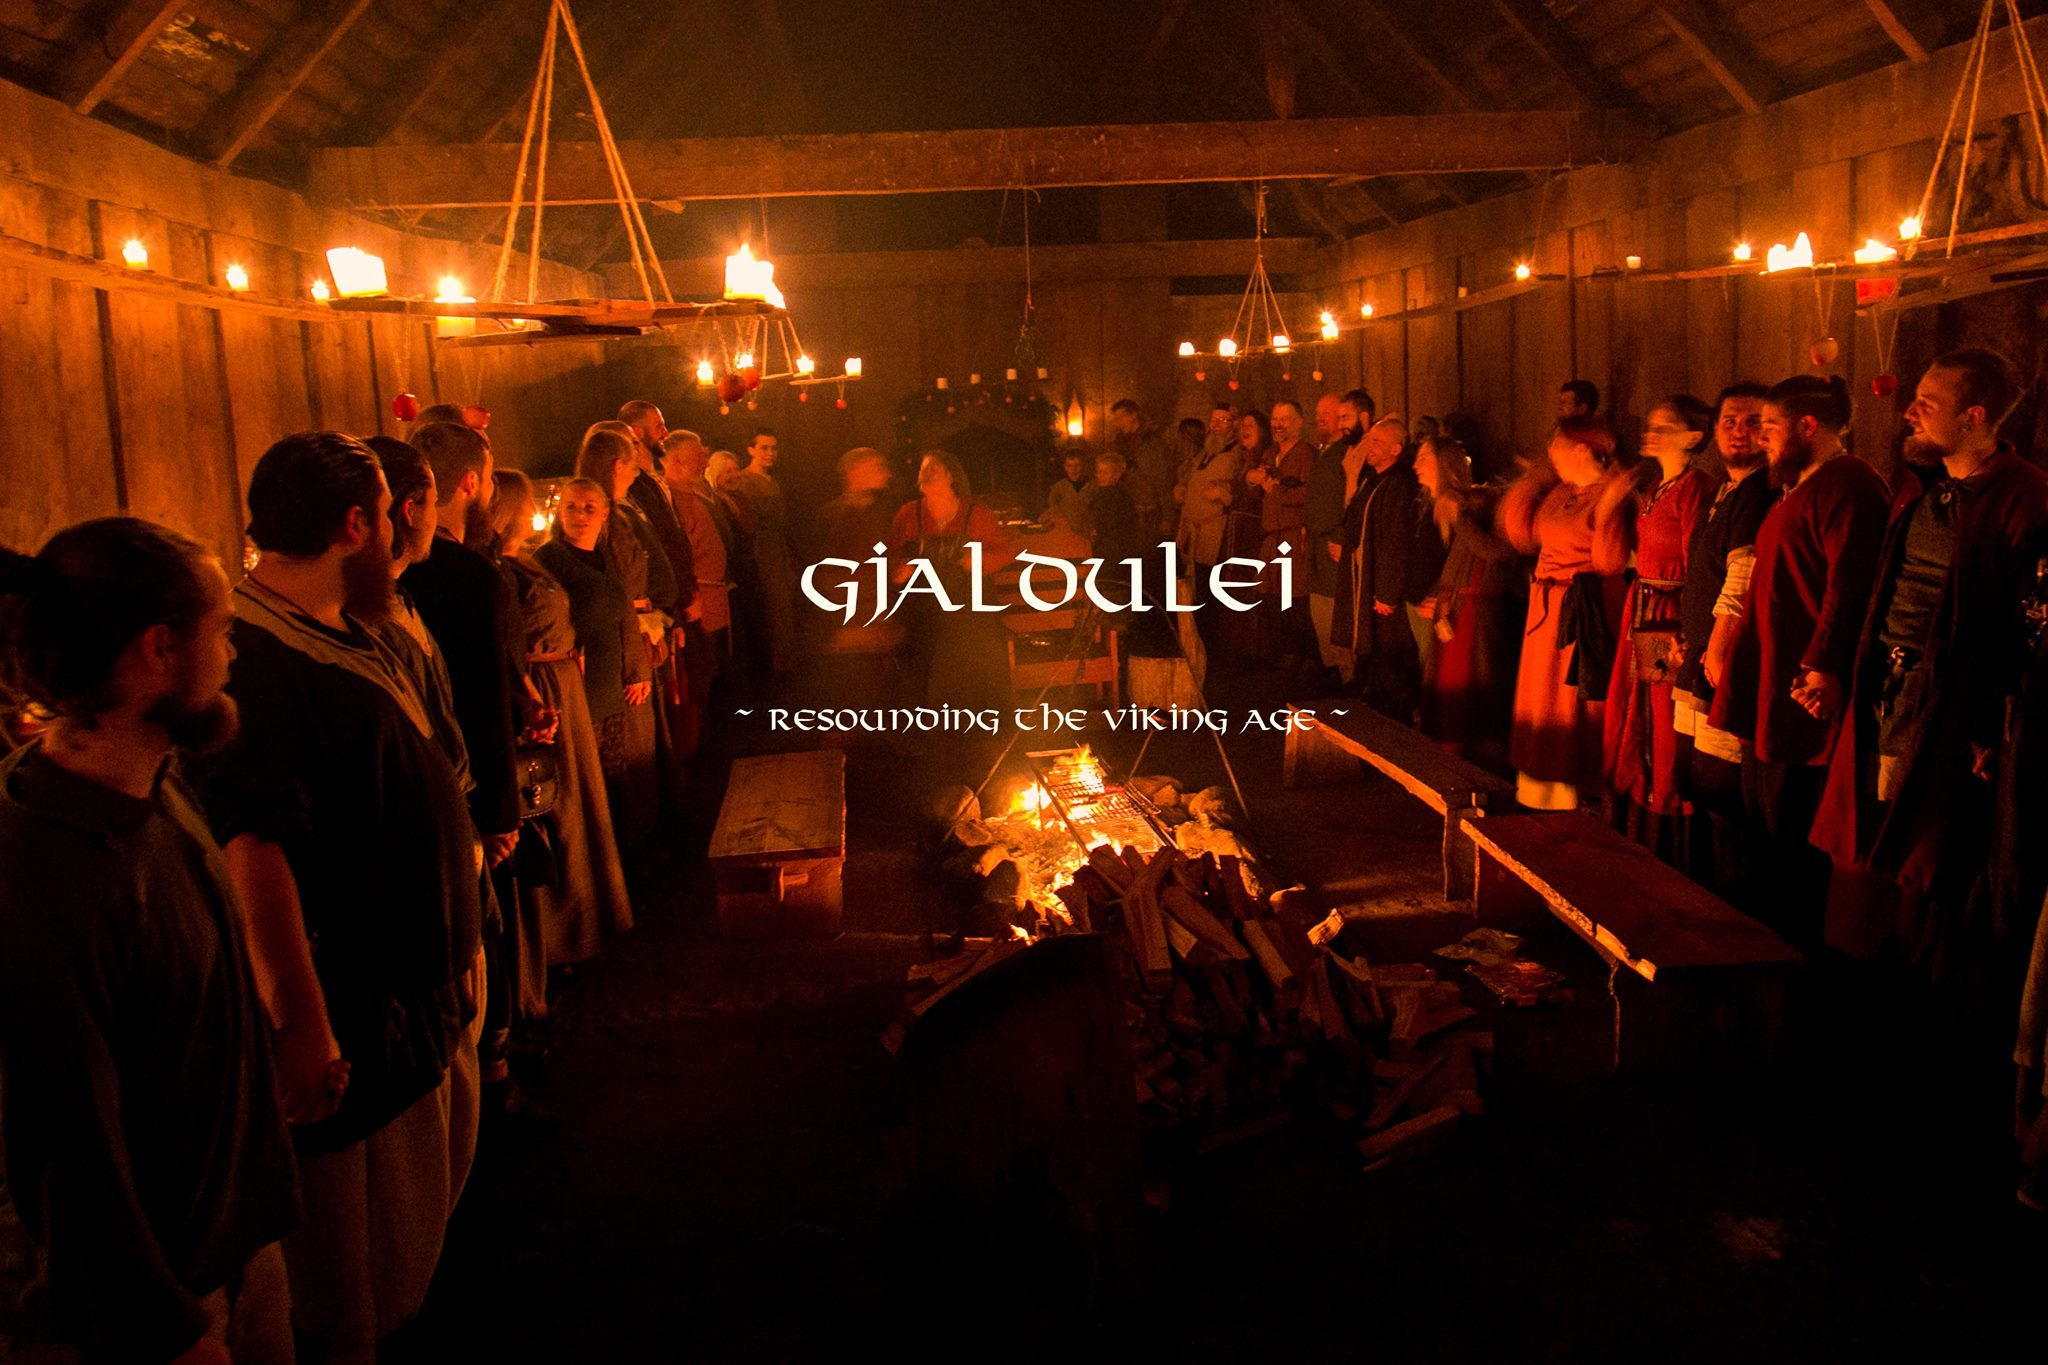 Gjaldulei – Resounding the Viking Age